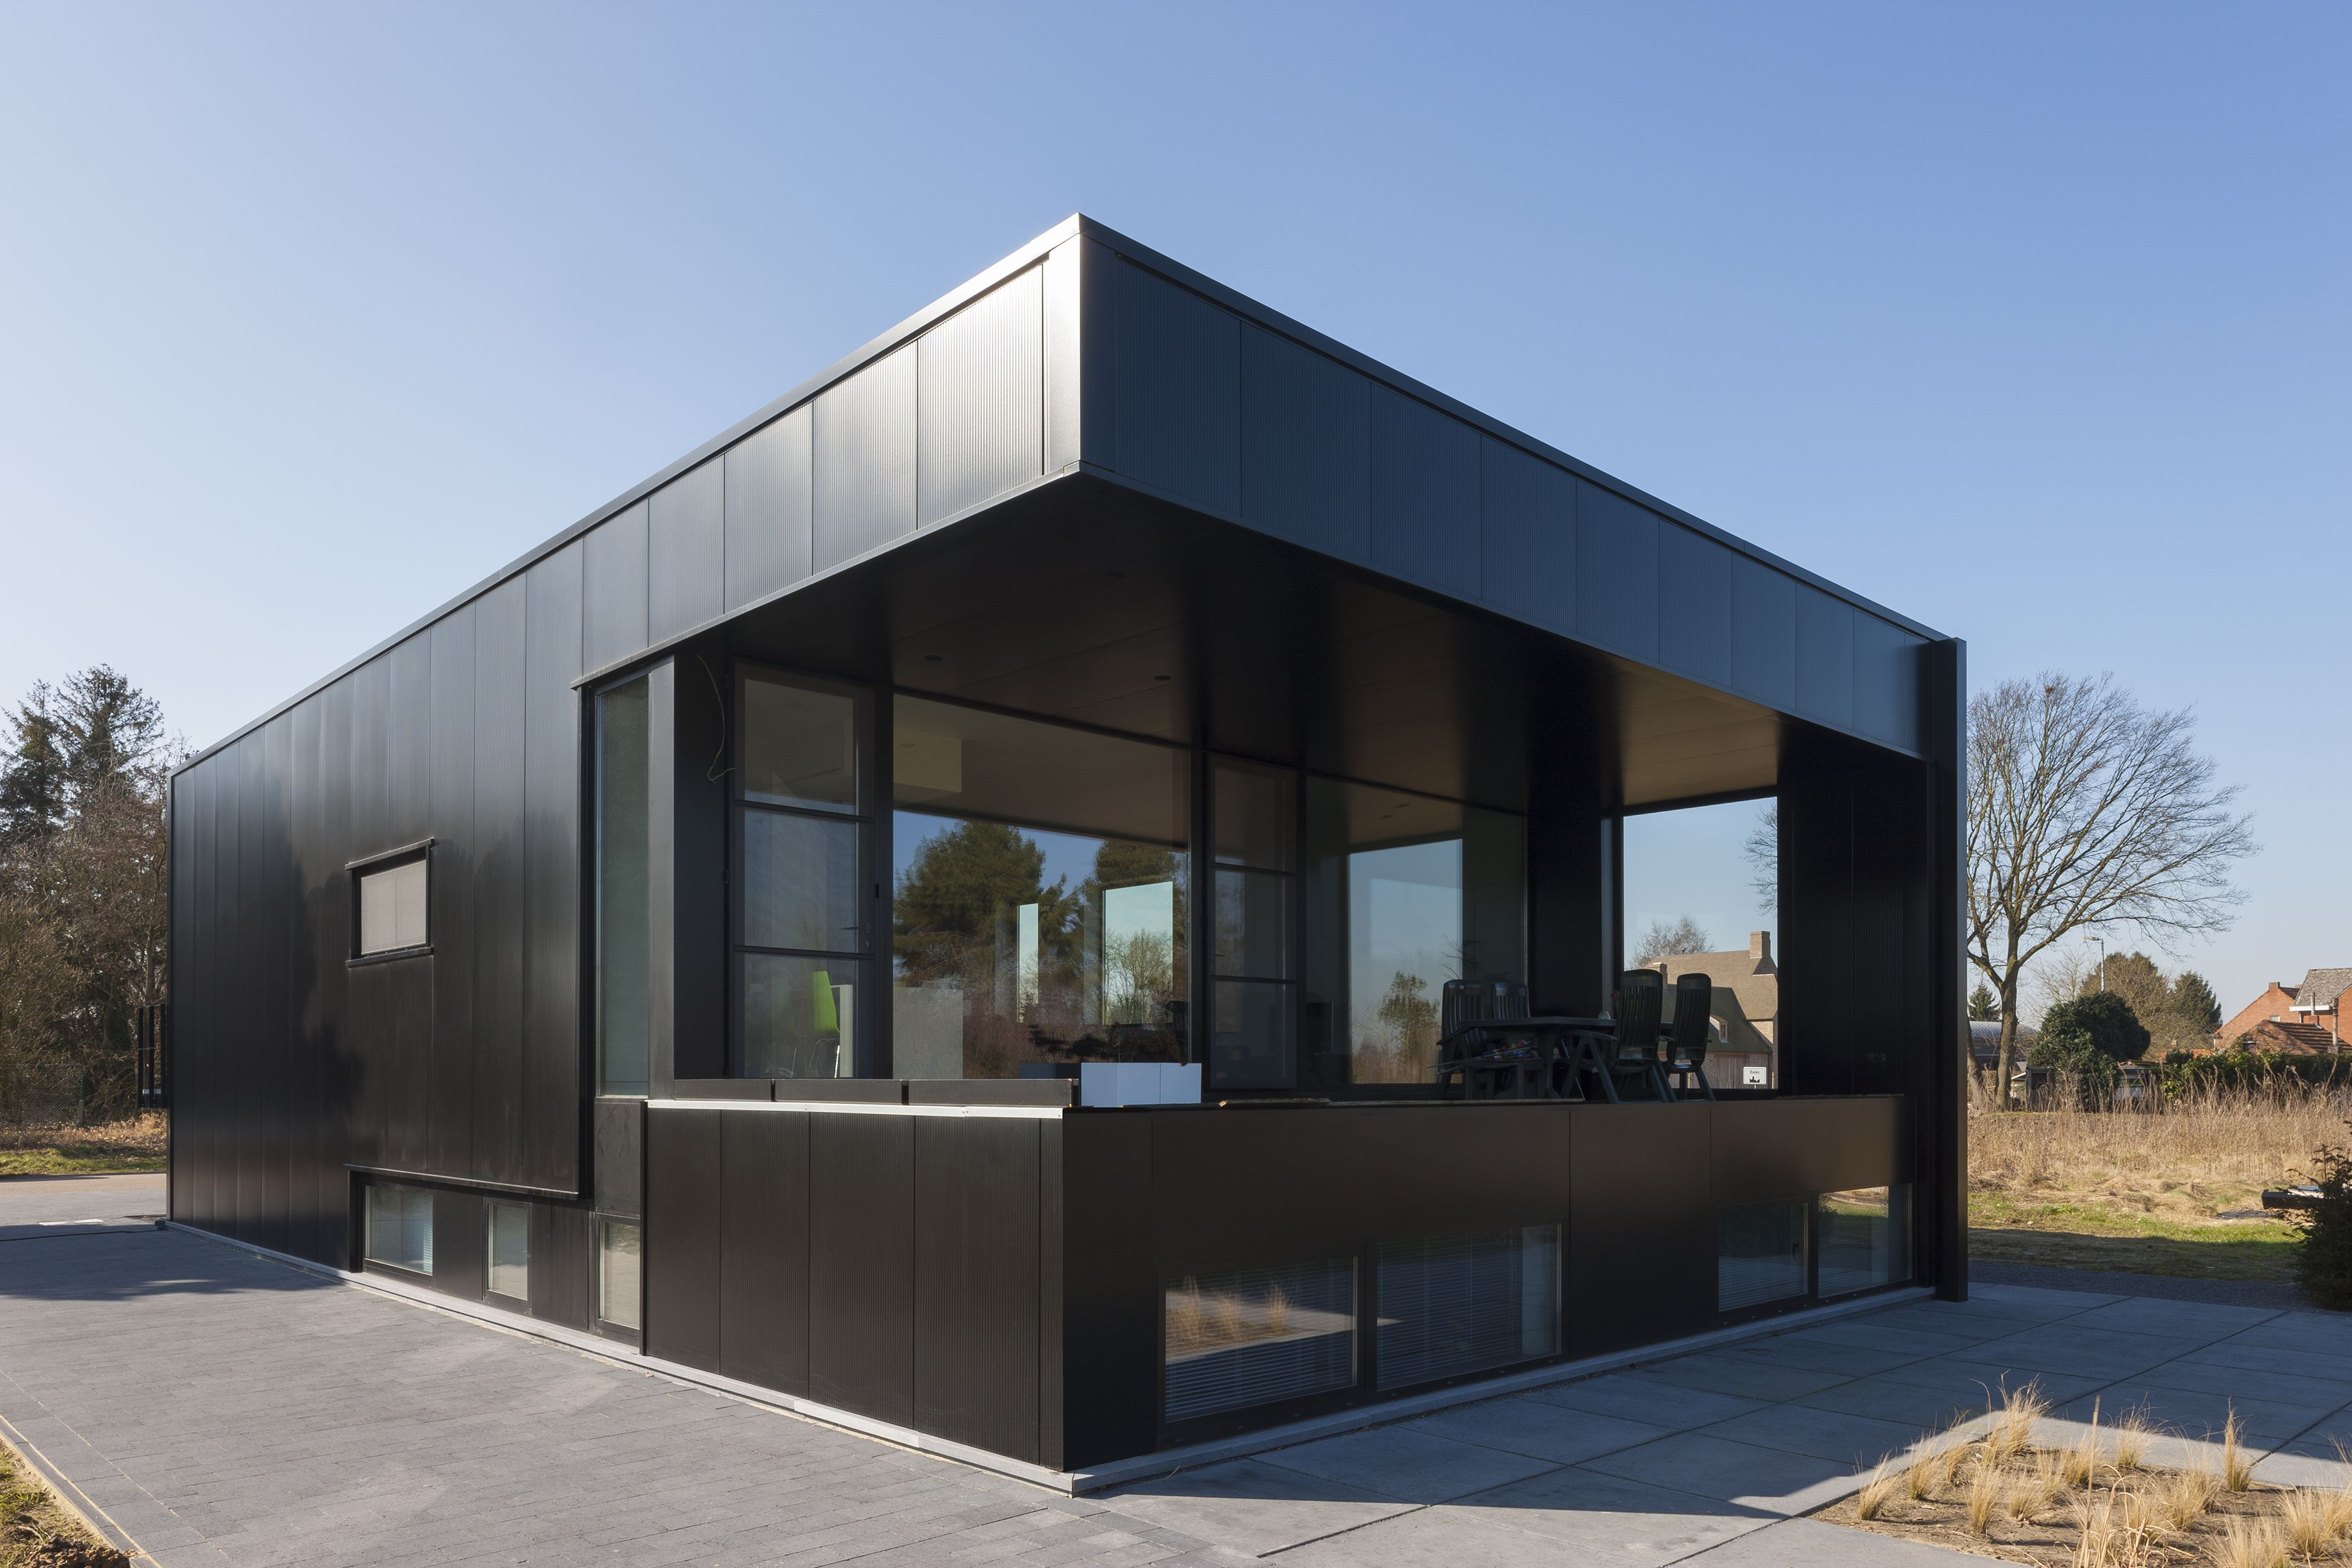 staalbouw woning | architectuur Sarah Theeuws | Pinterest